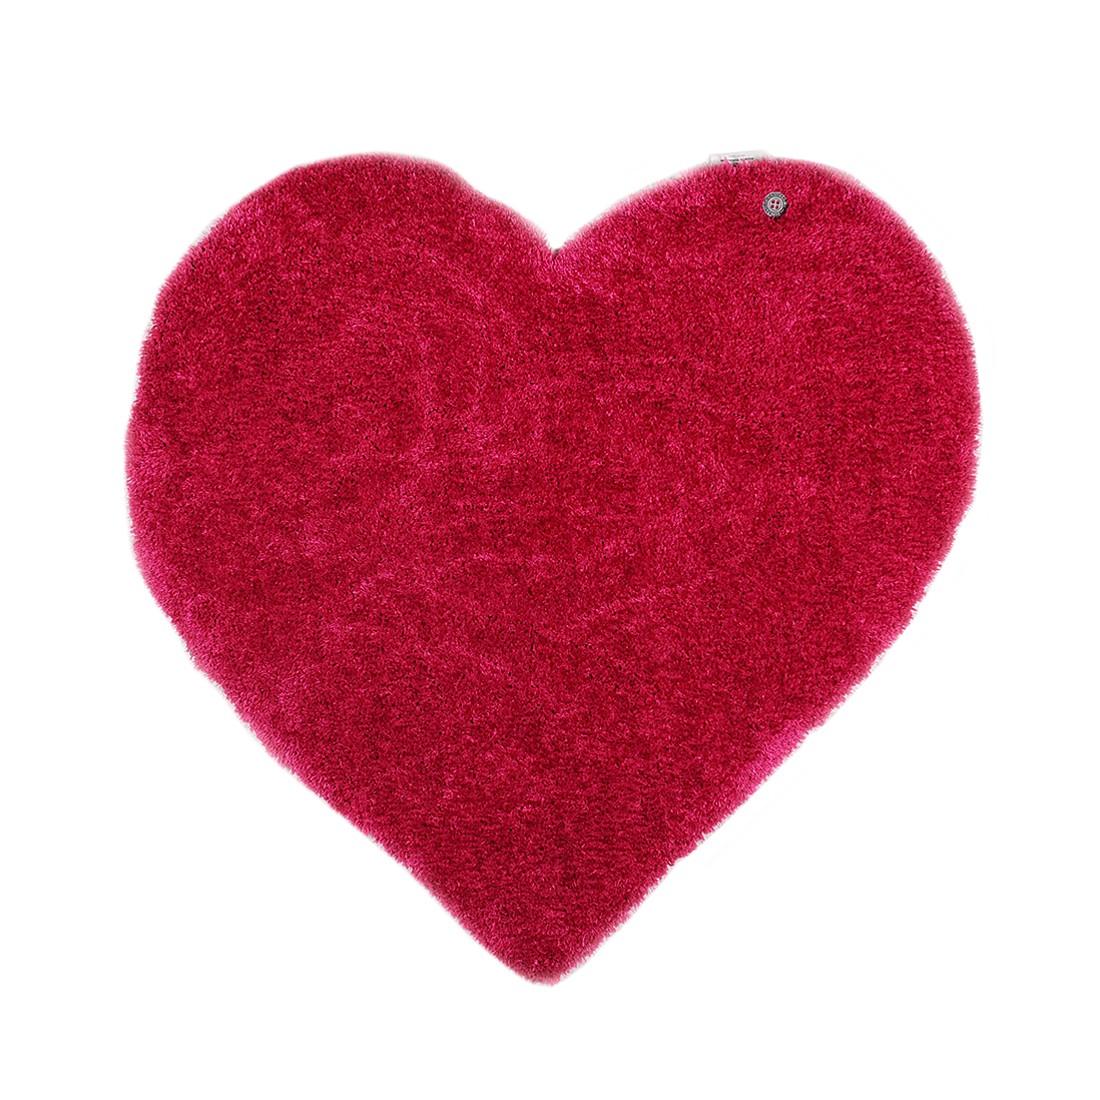 Home 24 - Tapis soft heart - rose vif - 100 x 100 cm, tom tailor